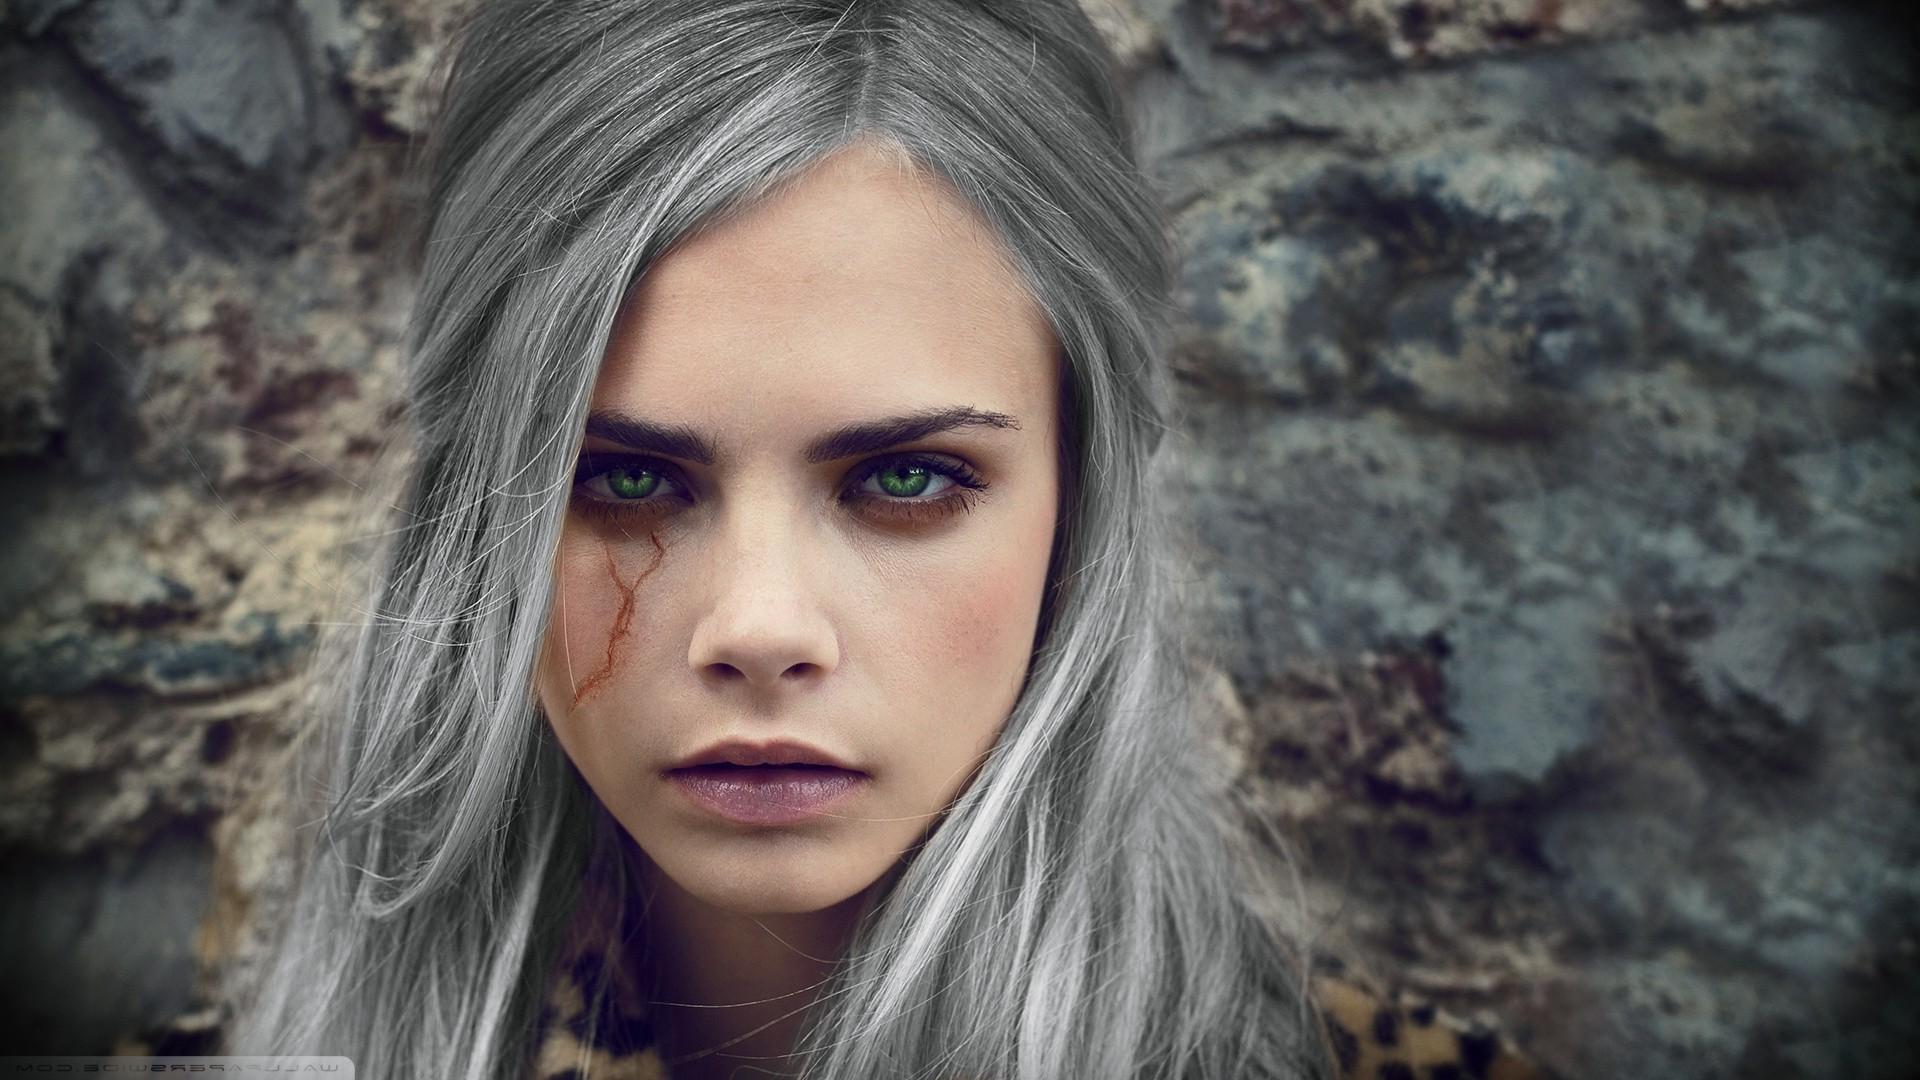 Wallpaper Face Women Cosplay Model Simple Background: Wallpaper : Face, Photoshop, Cosplay, Model, Cara